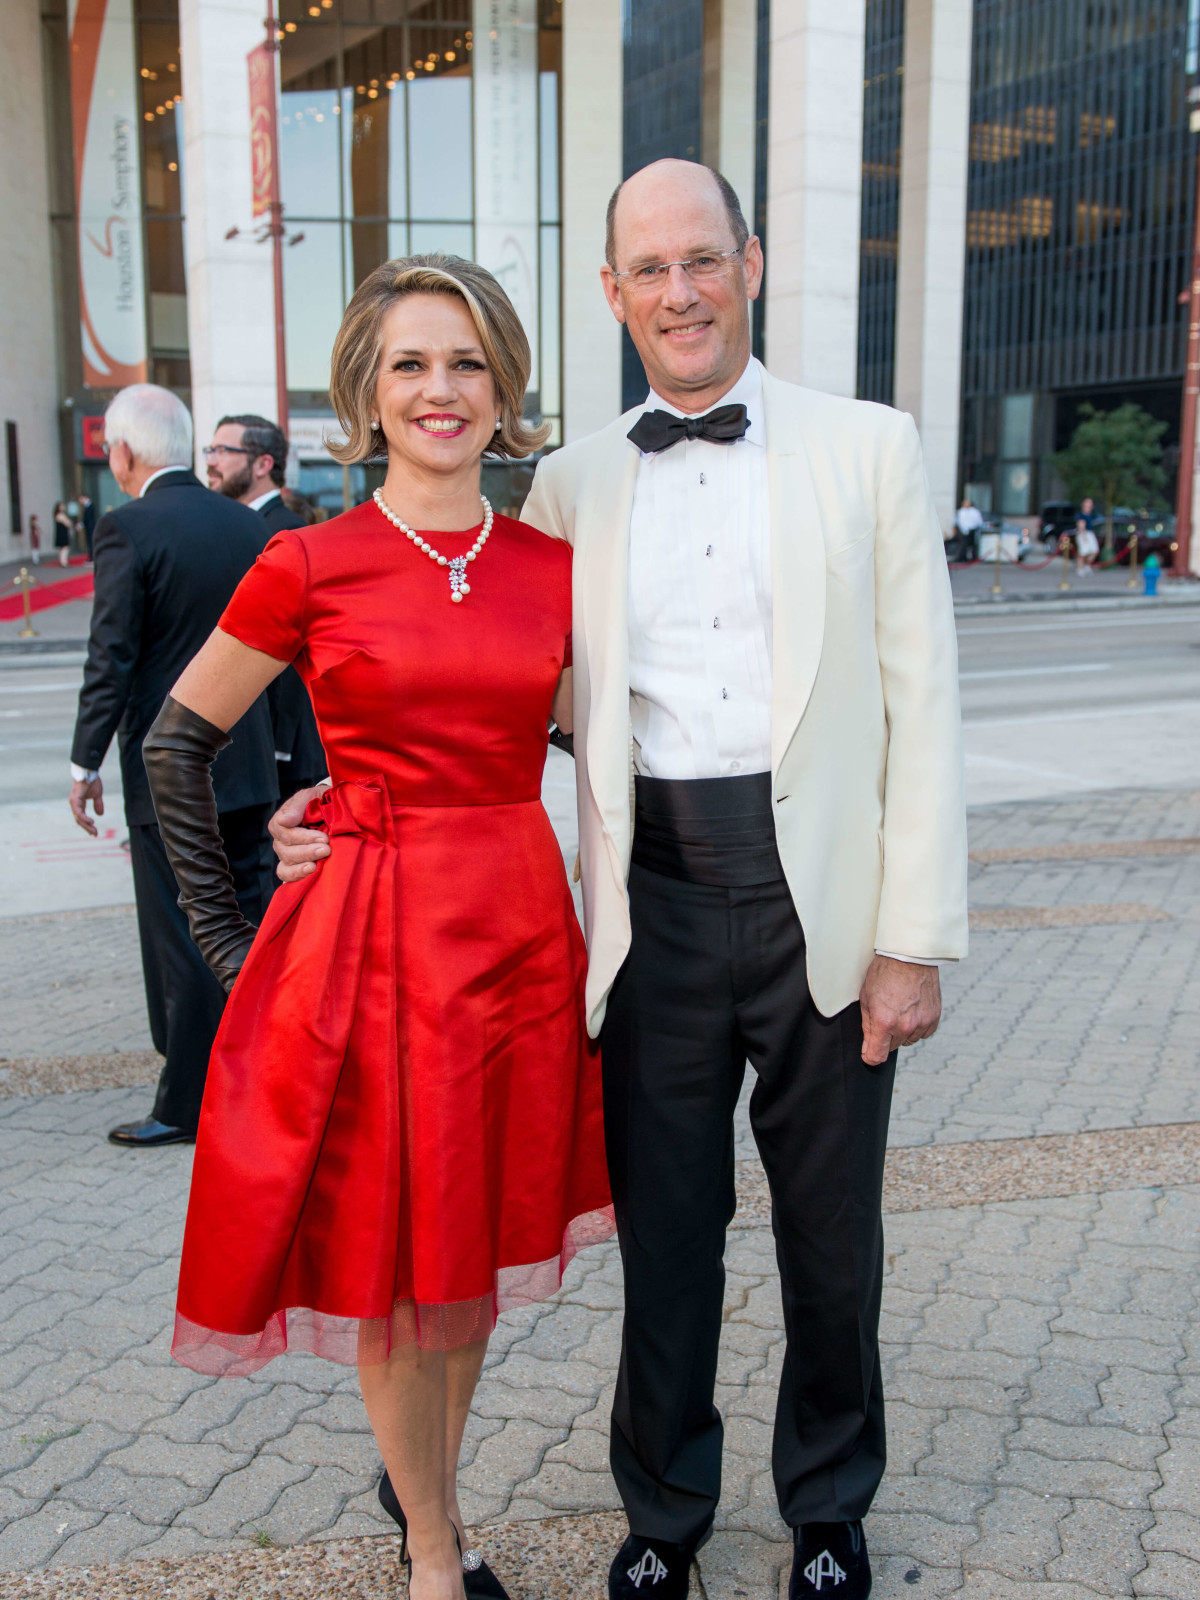 Jones Hall 50th Ball, Co-chairs David and Alexandra Pruner